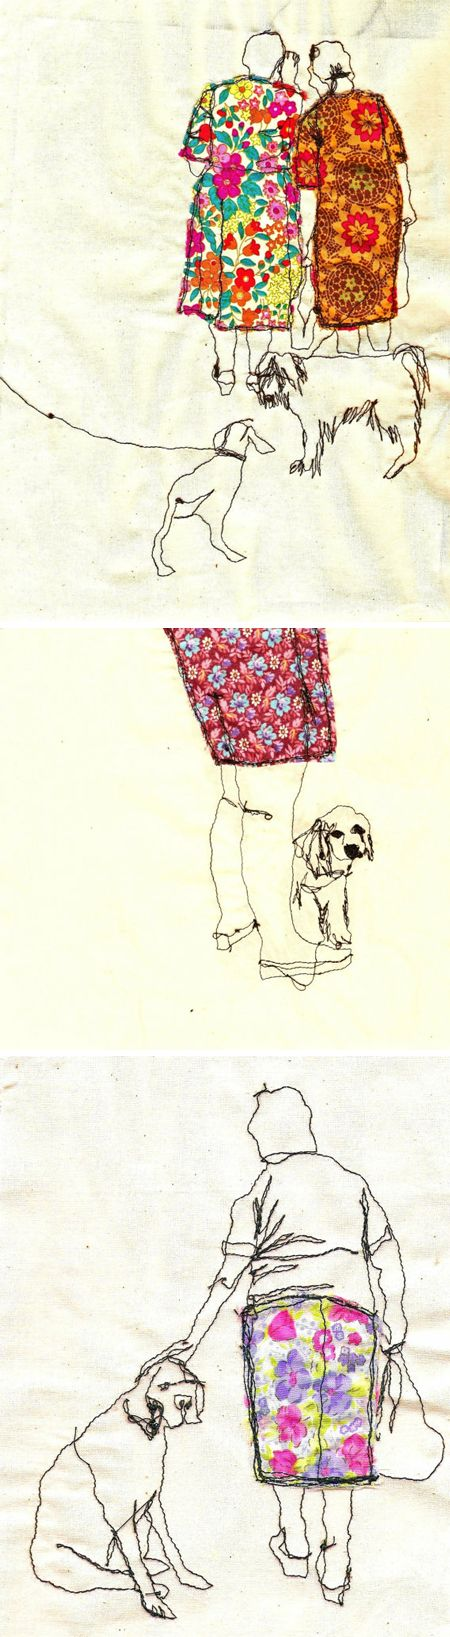 sarah walton - embroidery love!